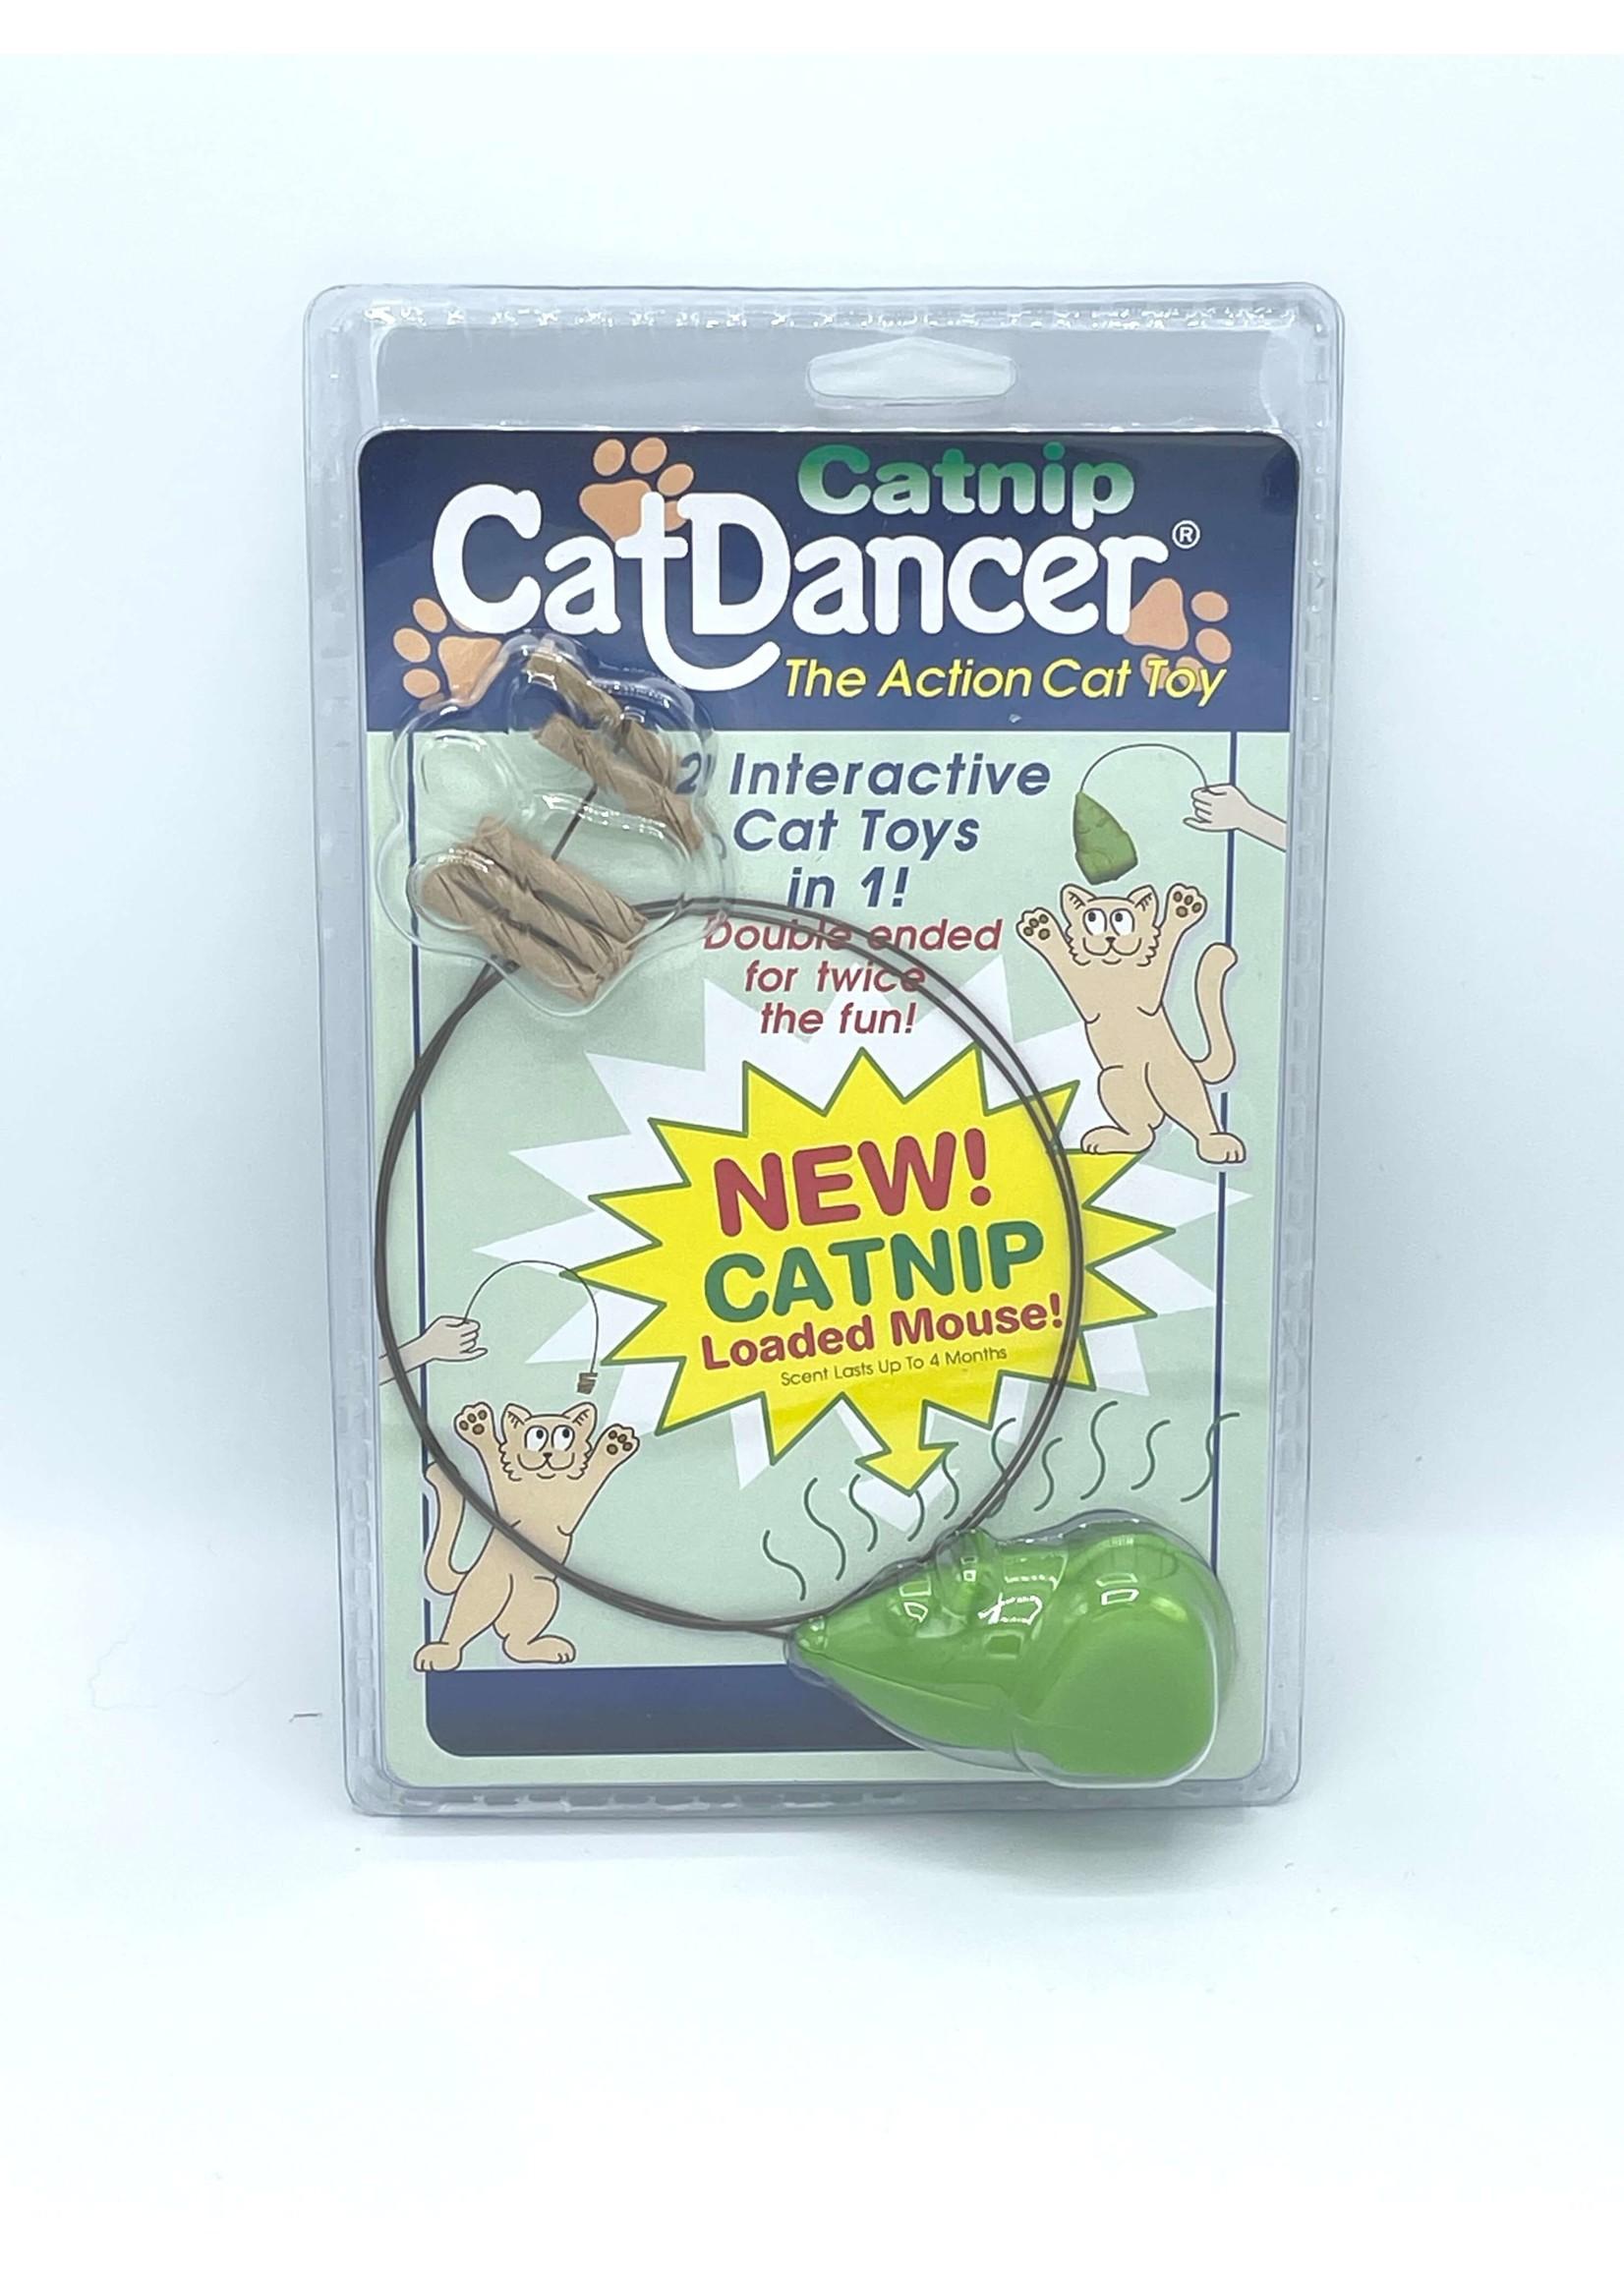 CatDancer Catnip Cat Dancer Interactive Cat Toy